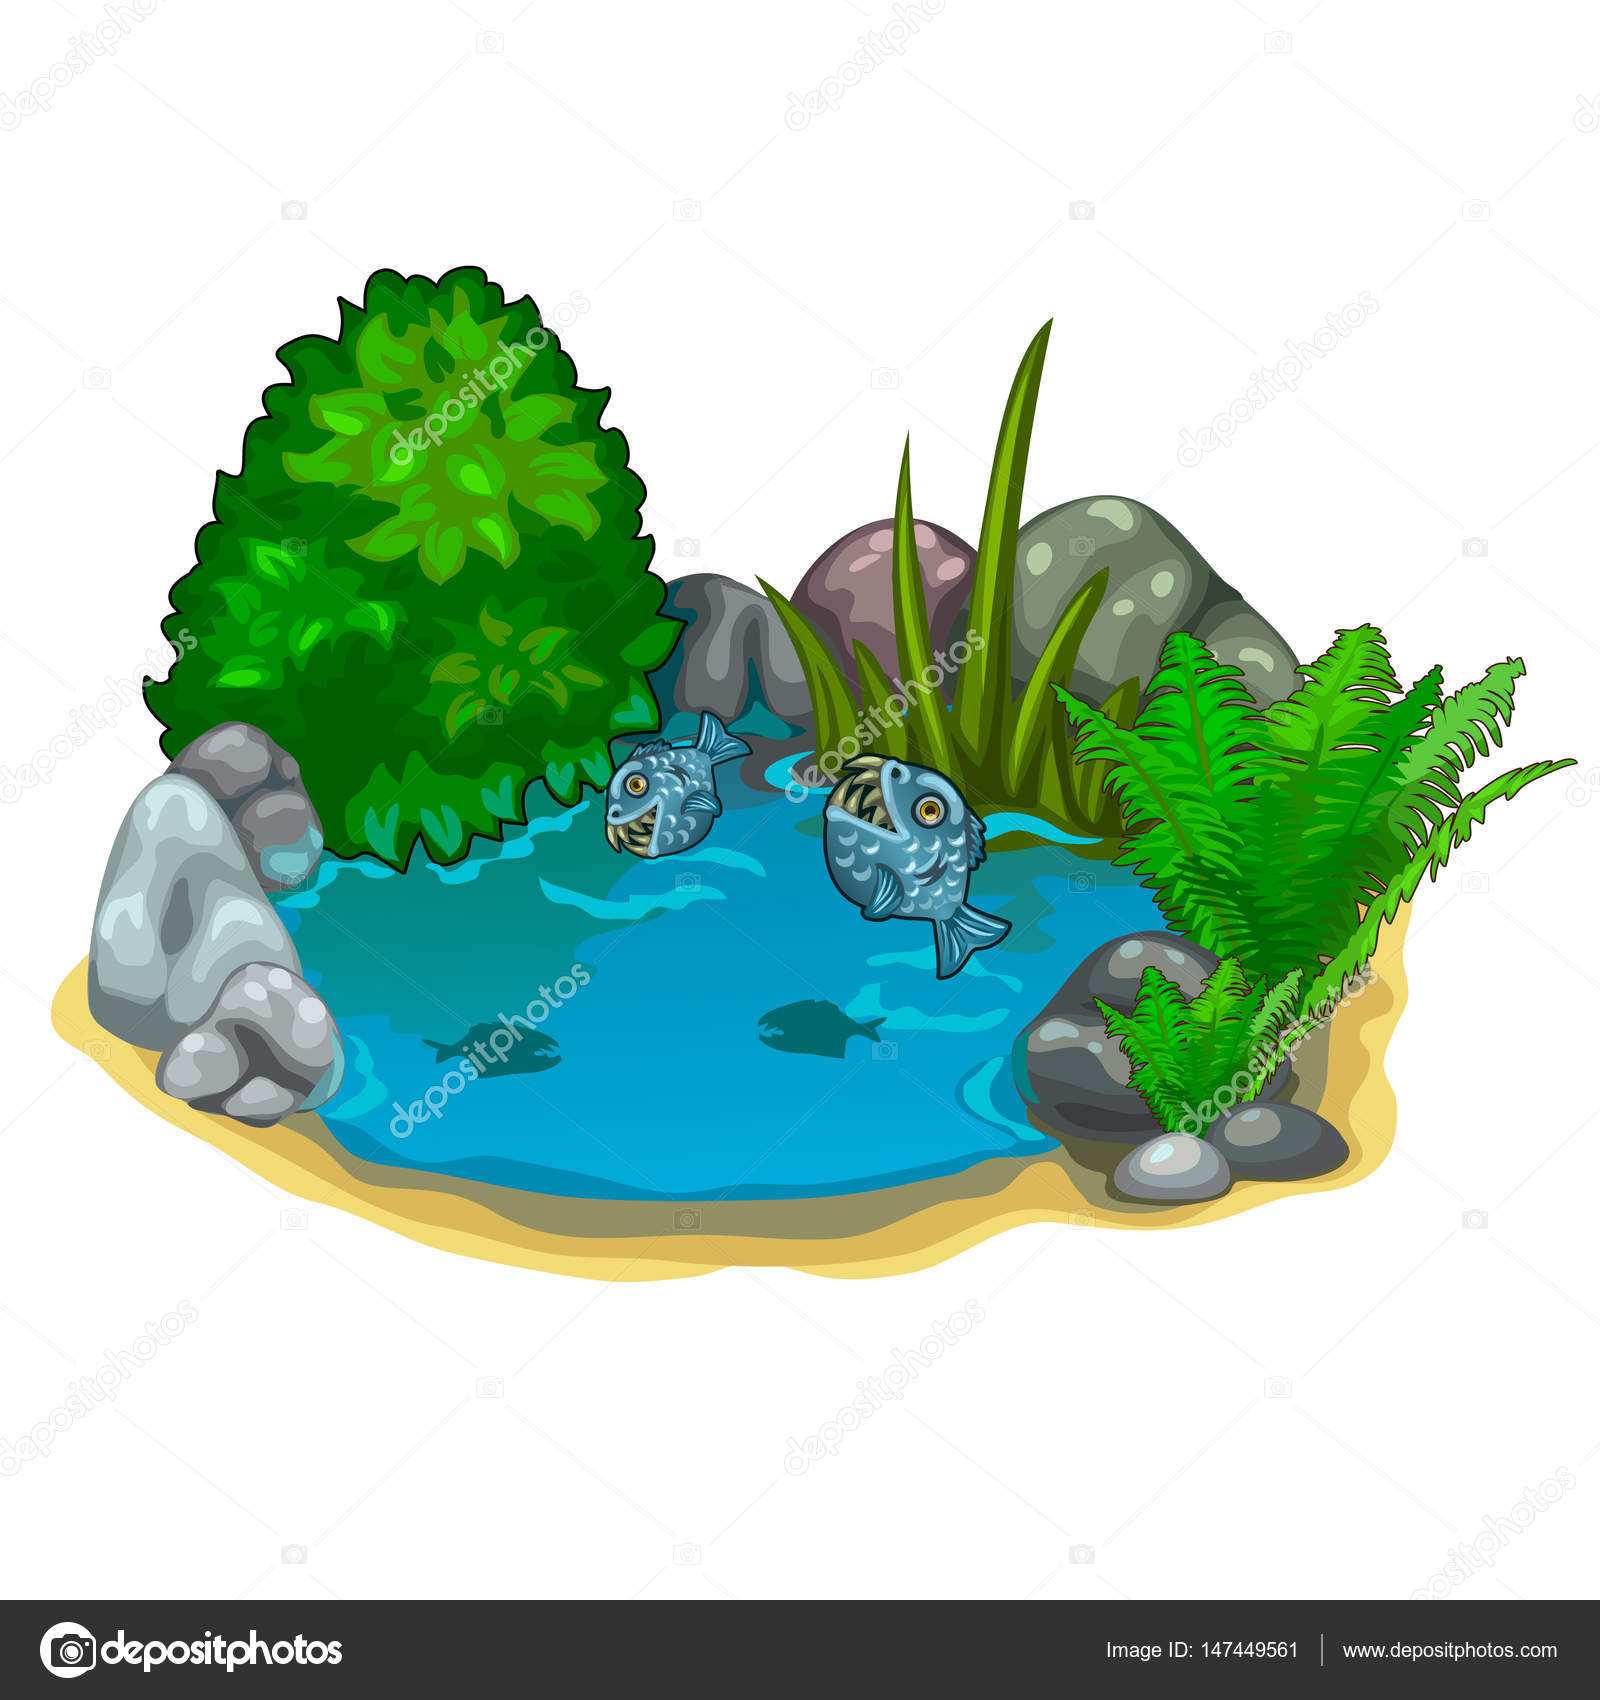 Rybn k s drav piran rostlinami a kameny stock vektor for Lonas para estanques de peces